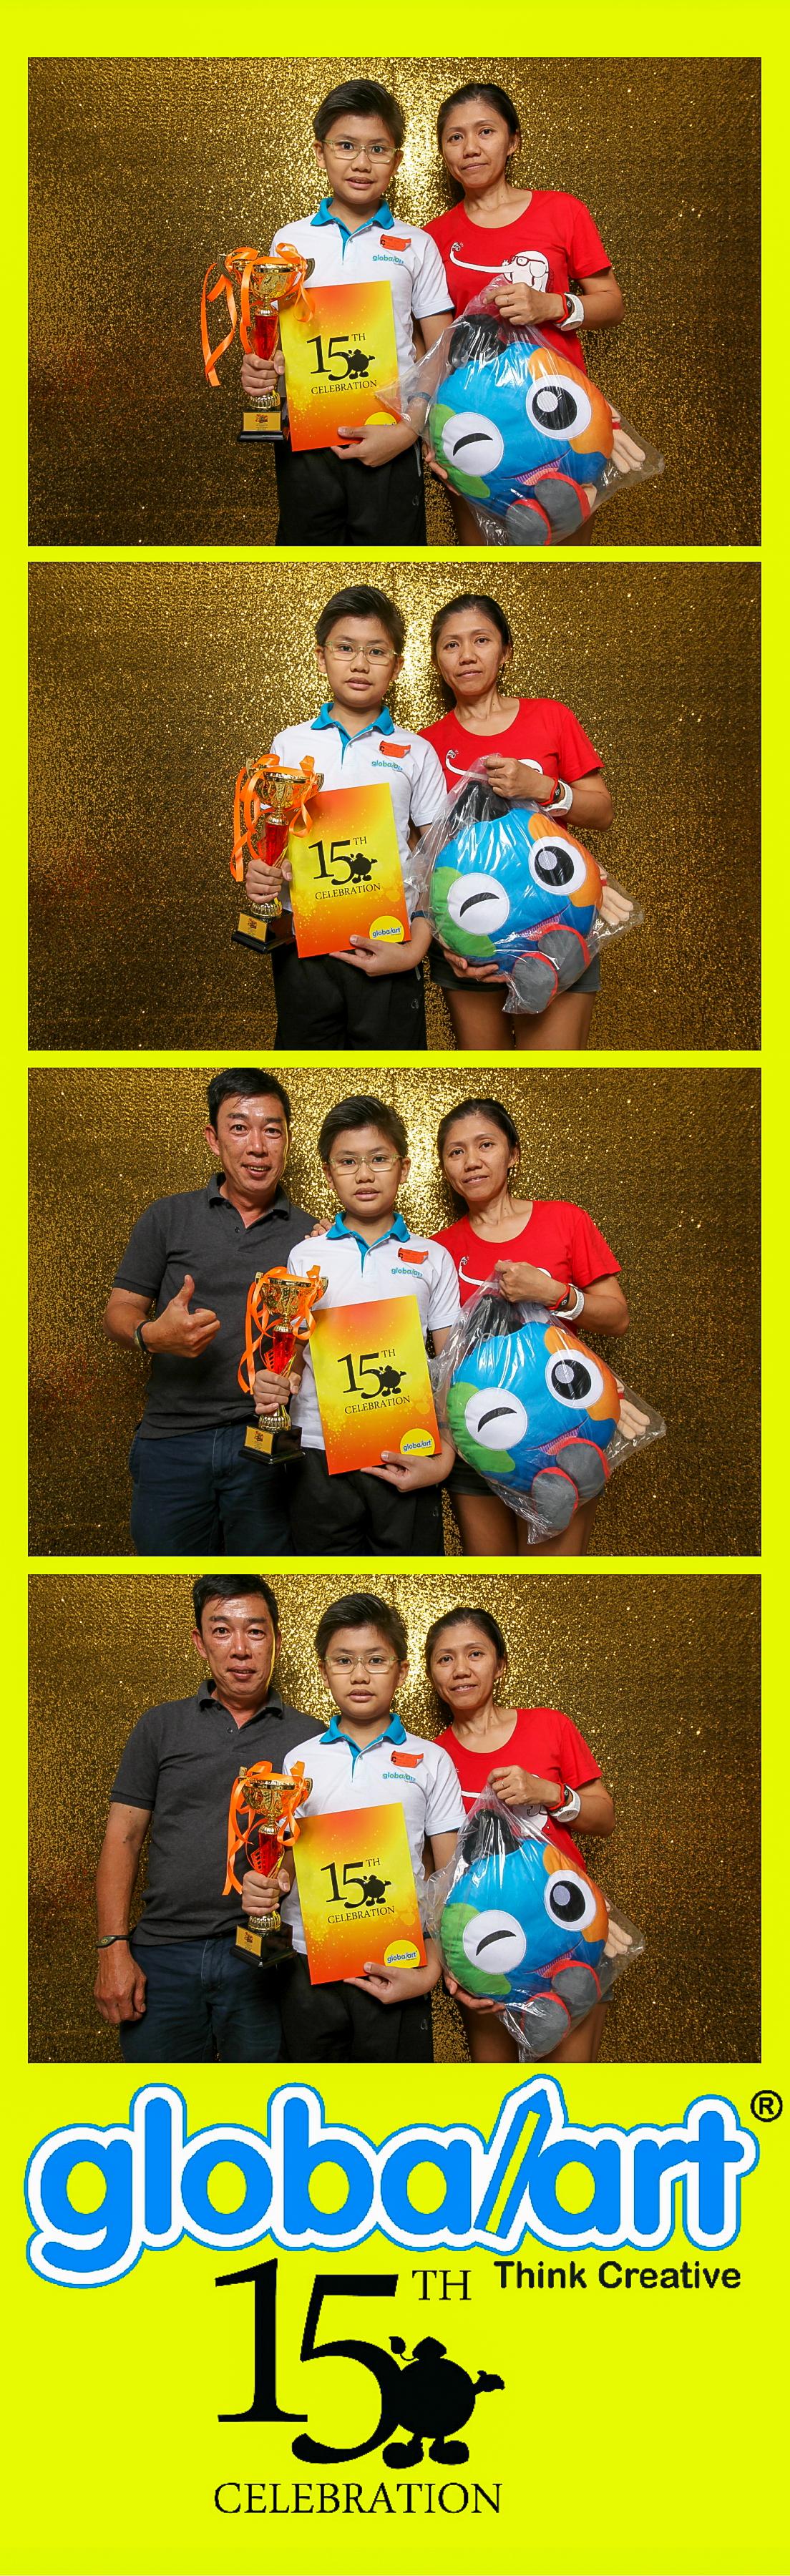 global art photo booth singapore (62)